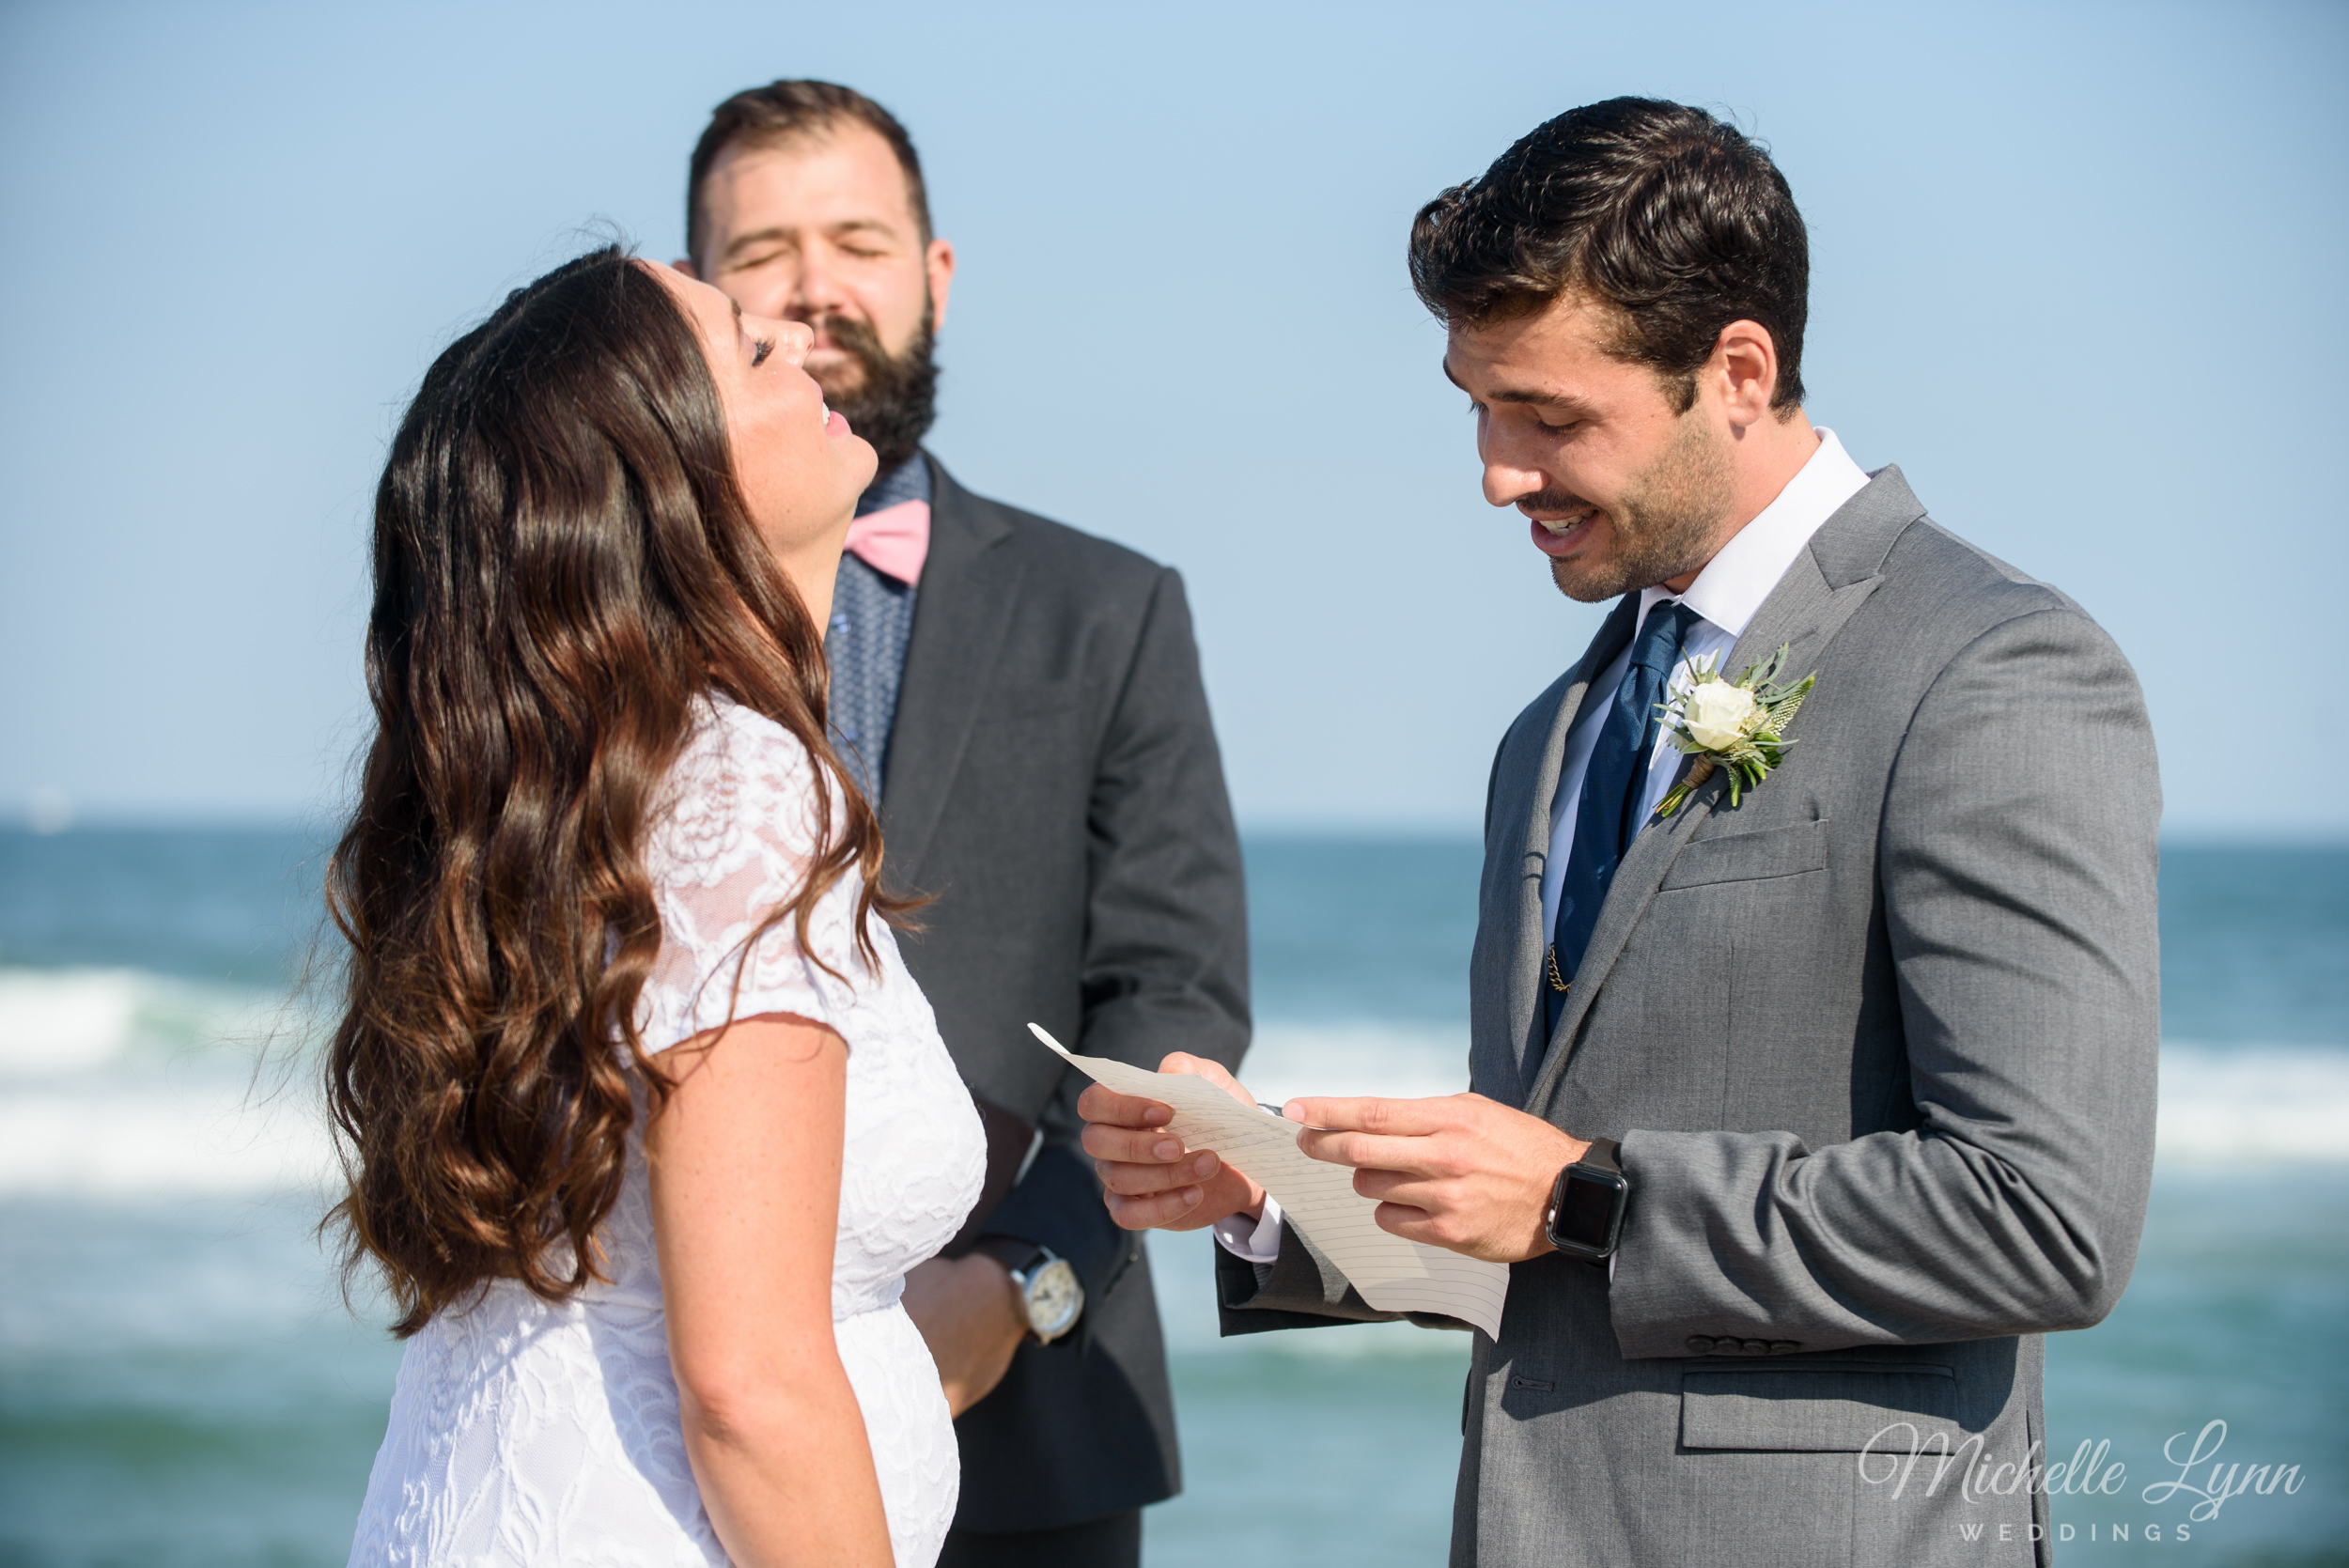 mlw-brant-beach-lbi-wedding-photography-25.jpg